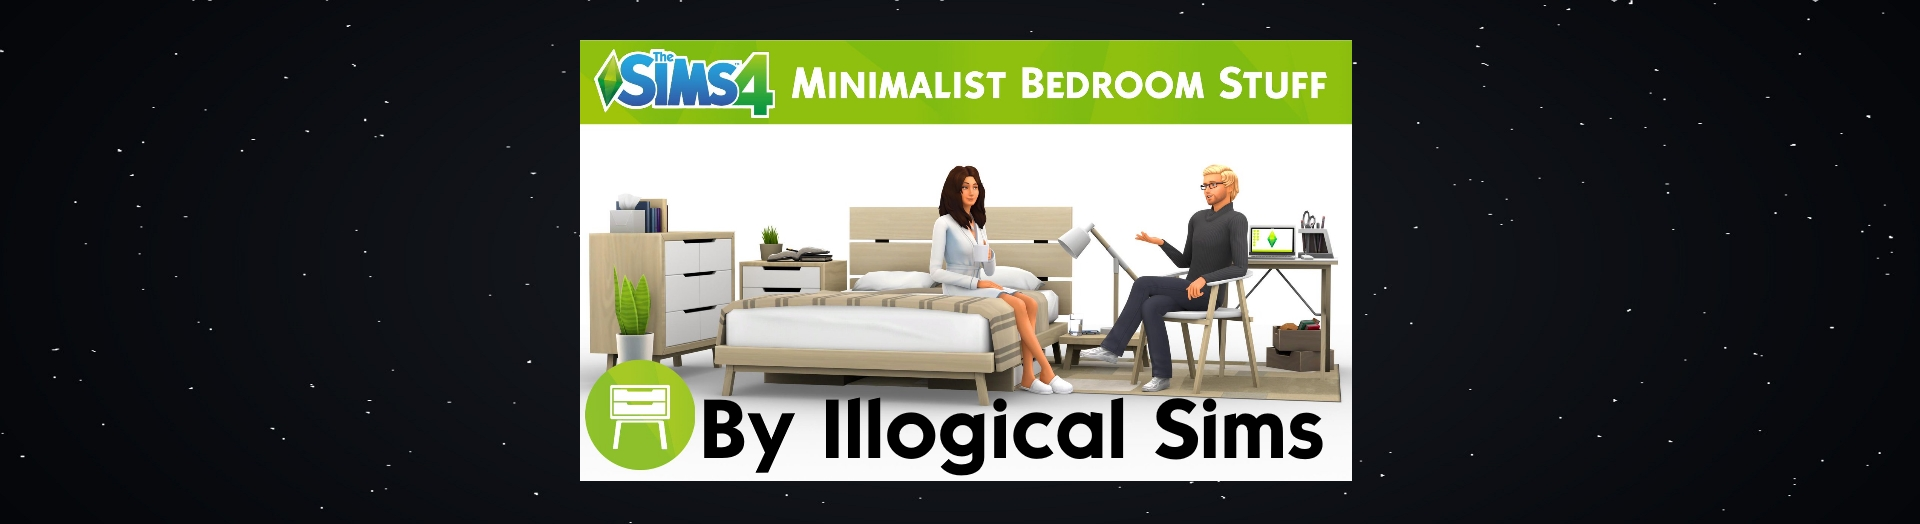 ▷ Kit d'Objets Minimaliste par Illogical Sims